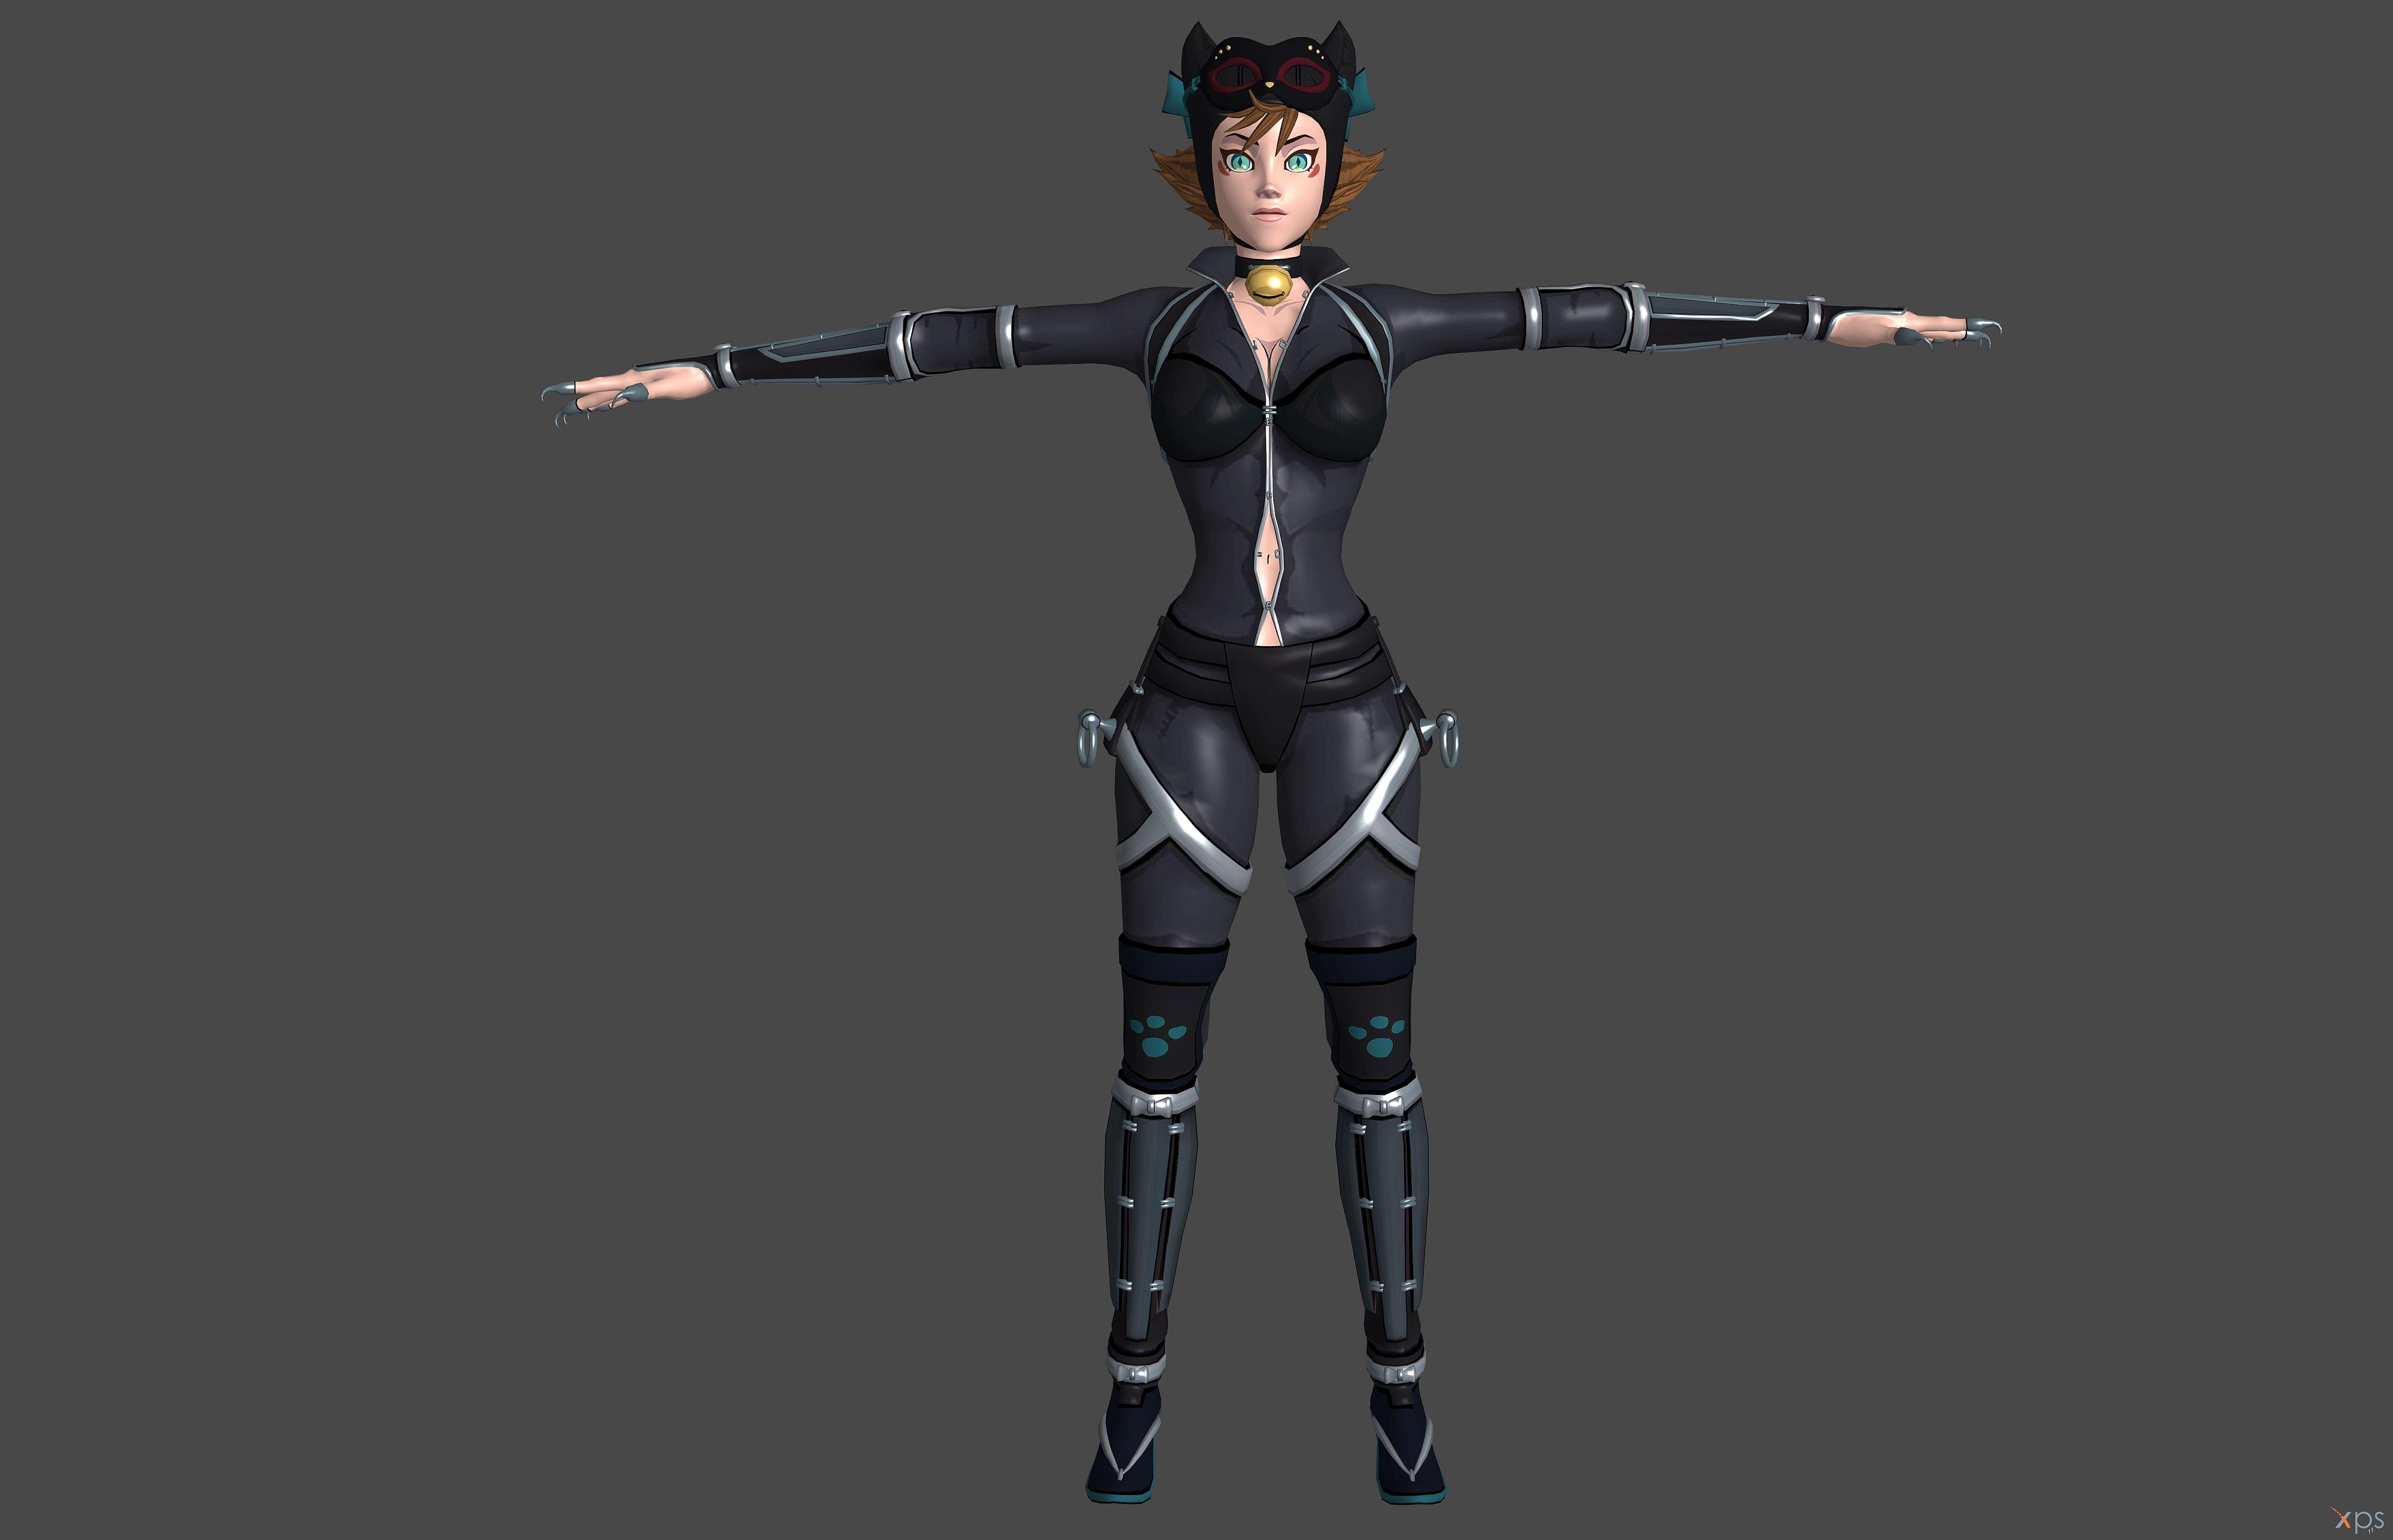 Injustice 2 Catwoman Batman Ninja Xps Only By Lezisell On Deviantart